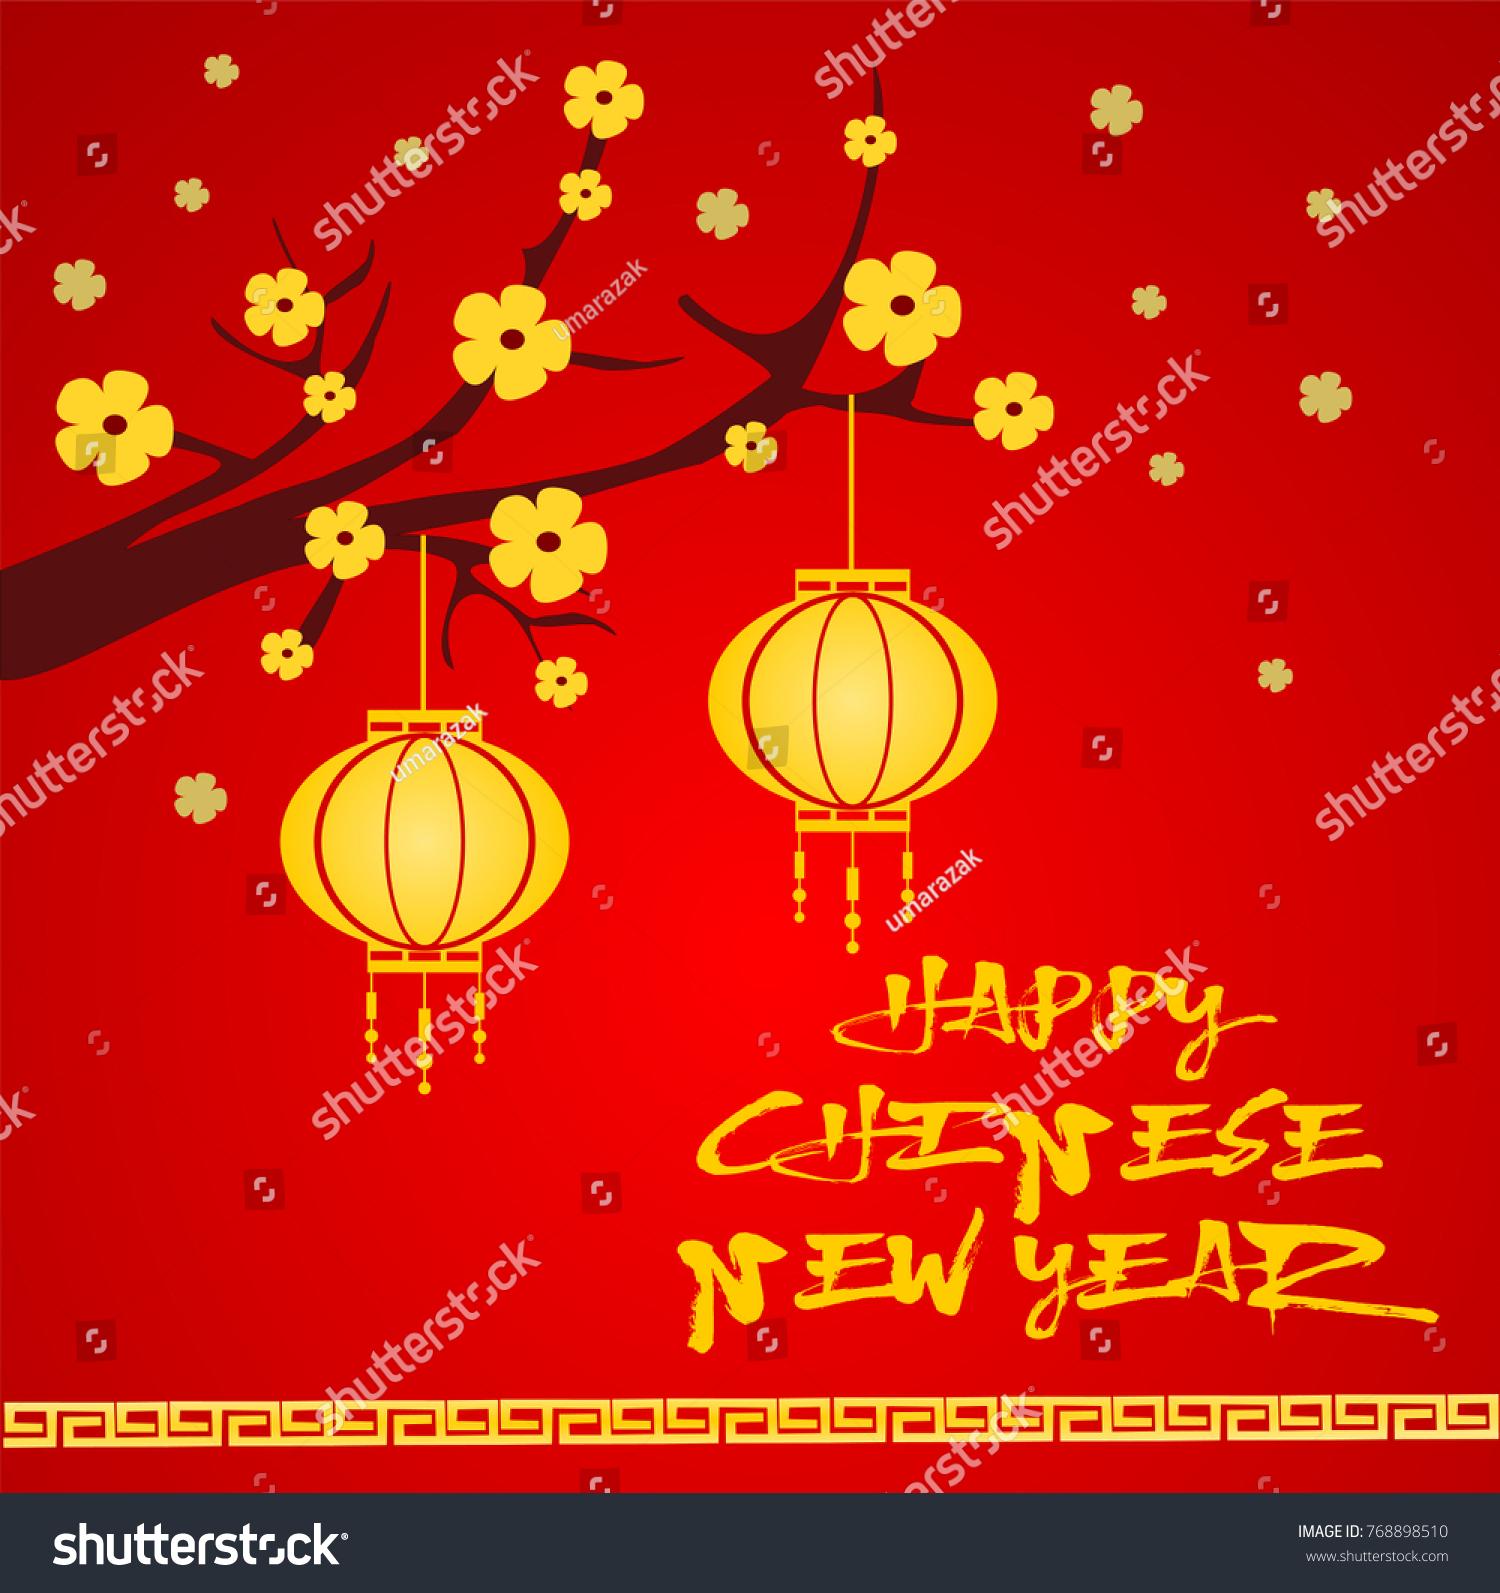 Happy chinese new year greeting celebration stock vector royalty happy chinese new year greeting celebration illustration vector m4hsunfo